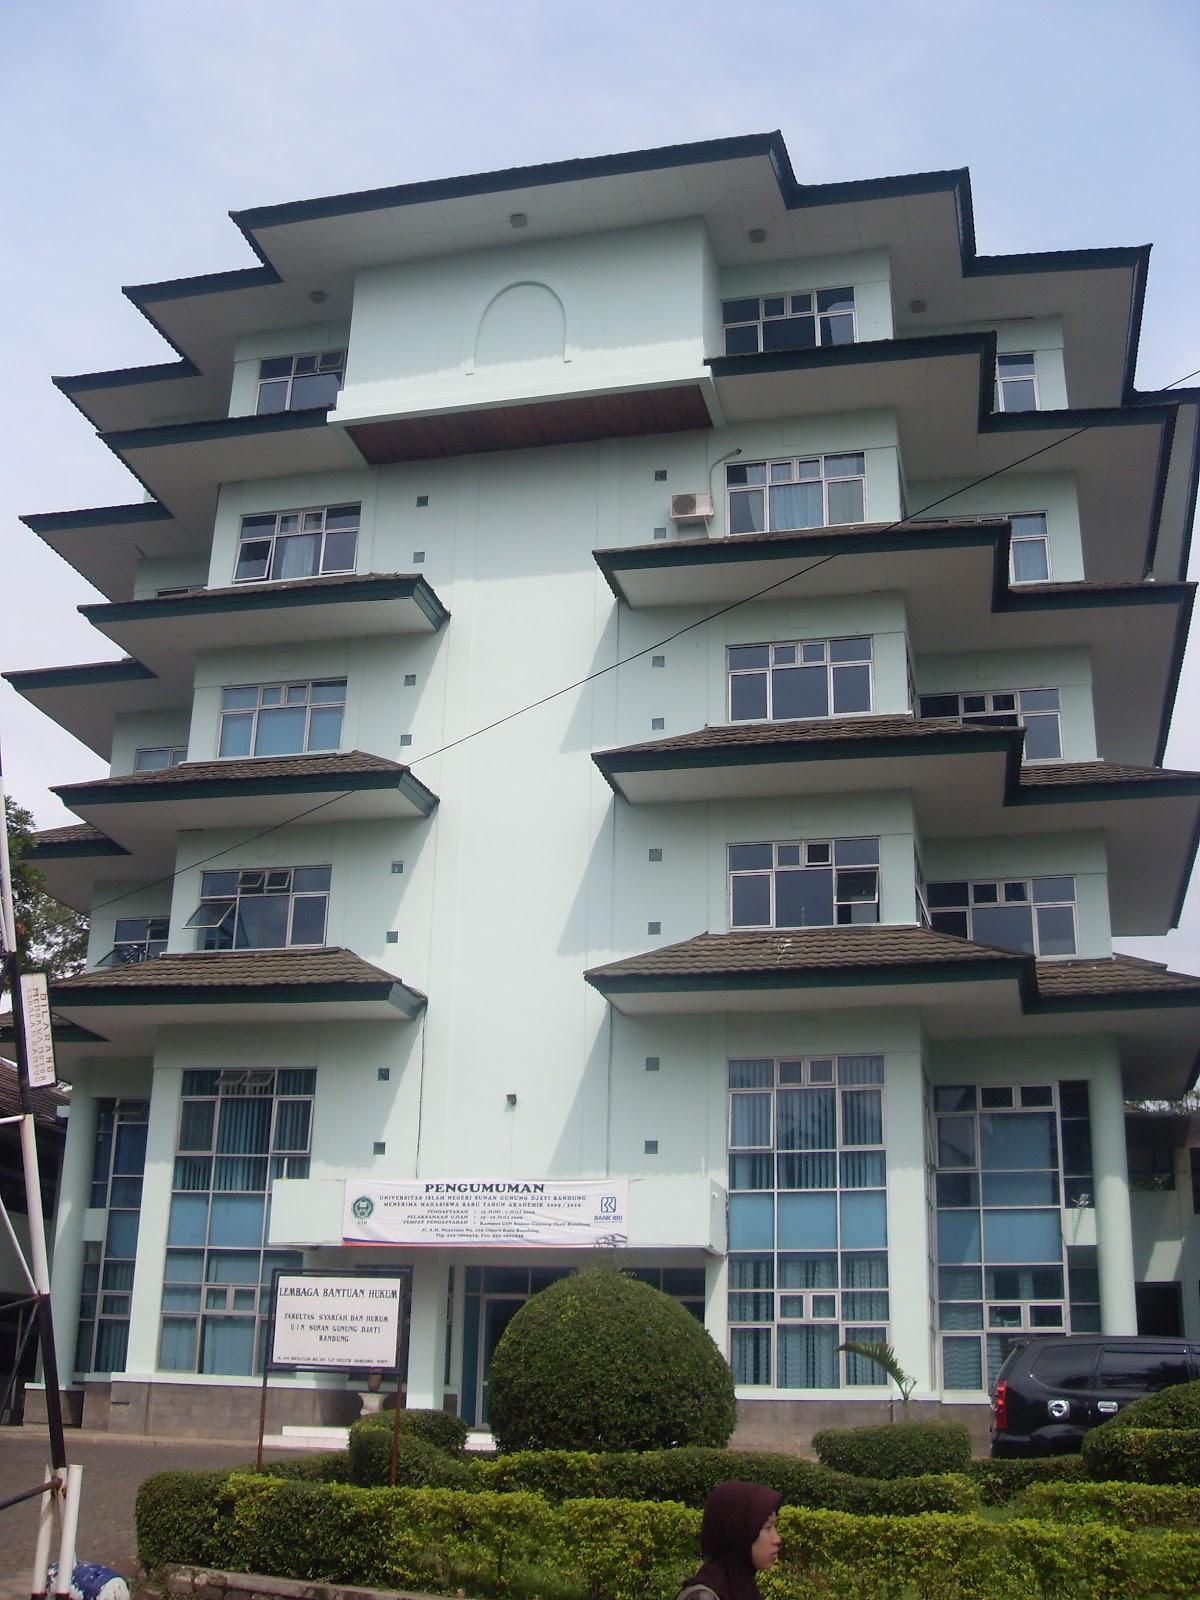 Jejak Sang Pemenang Uin Sgd Universitas Islam Negeri Sunan Gunung Djati Bandung Jawa Barat